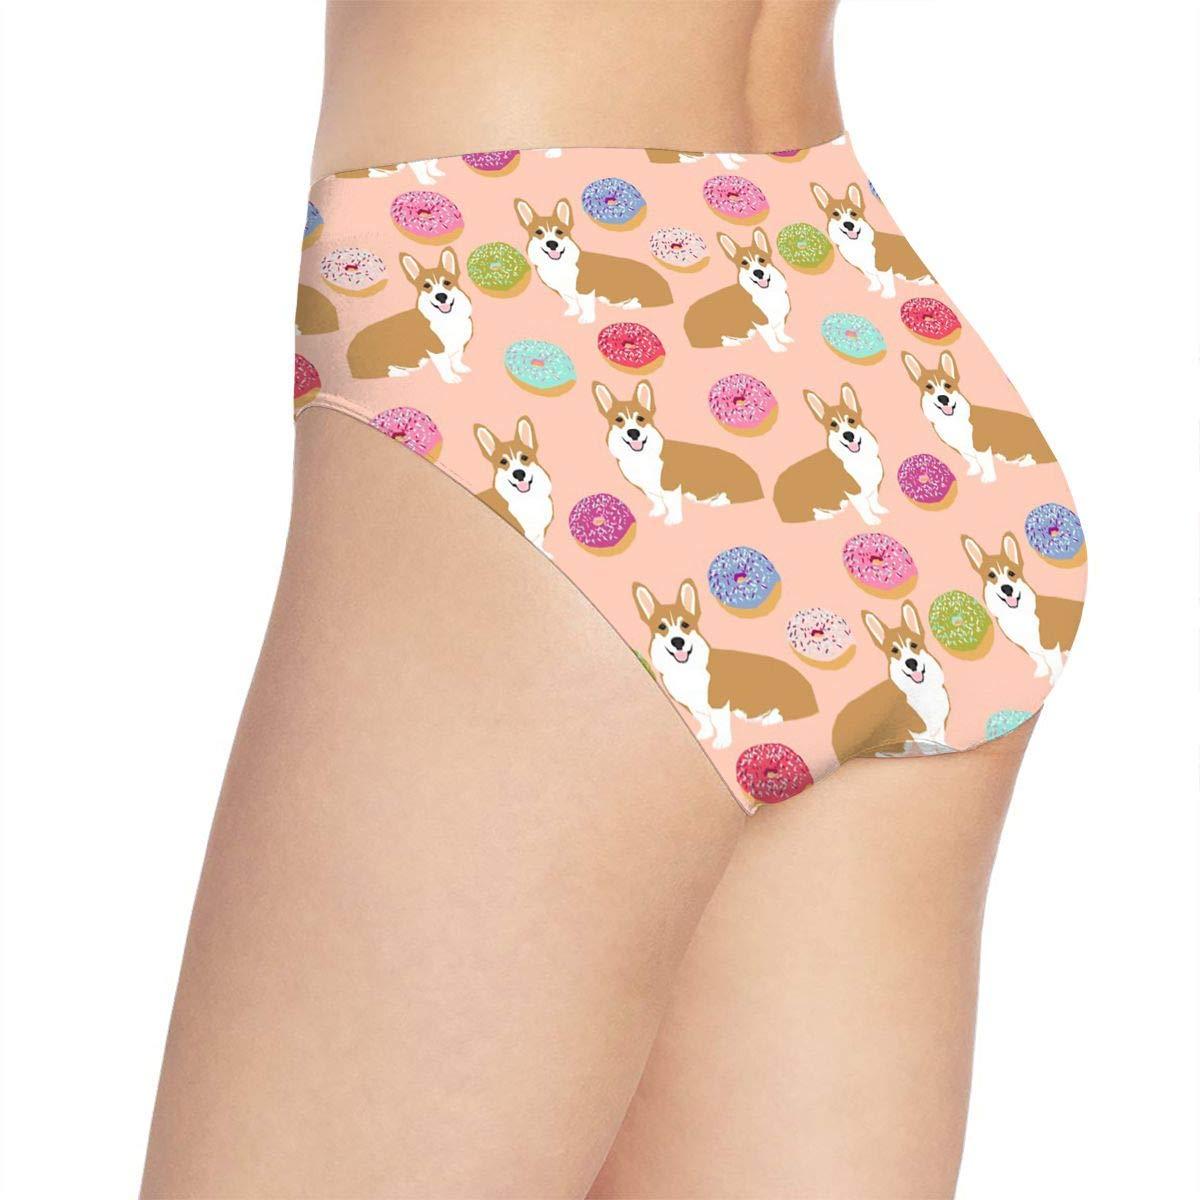 Eplus Womens Doughnuts Bulldog Underwear Soft Bikini Briefs Panties